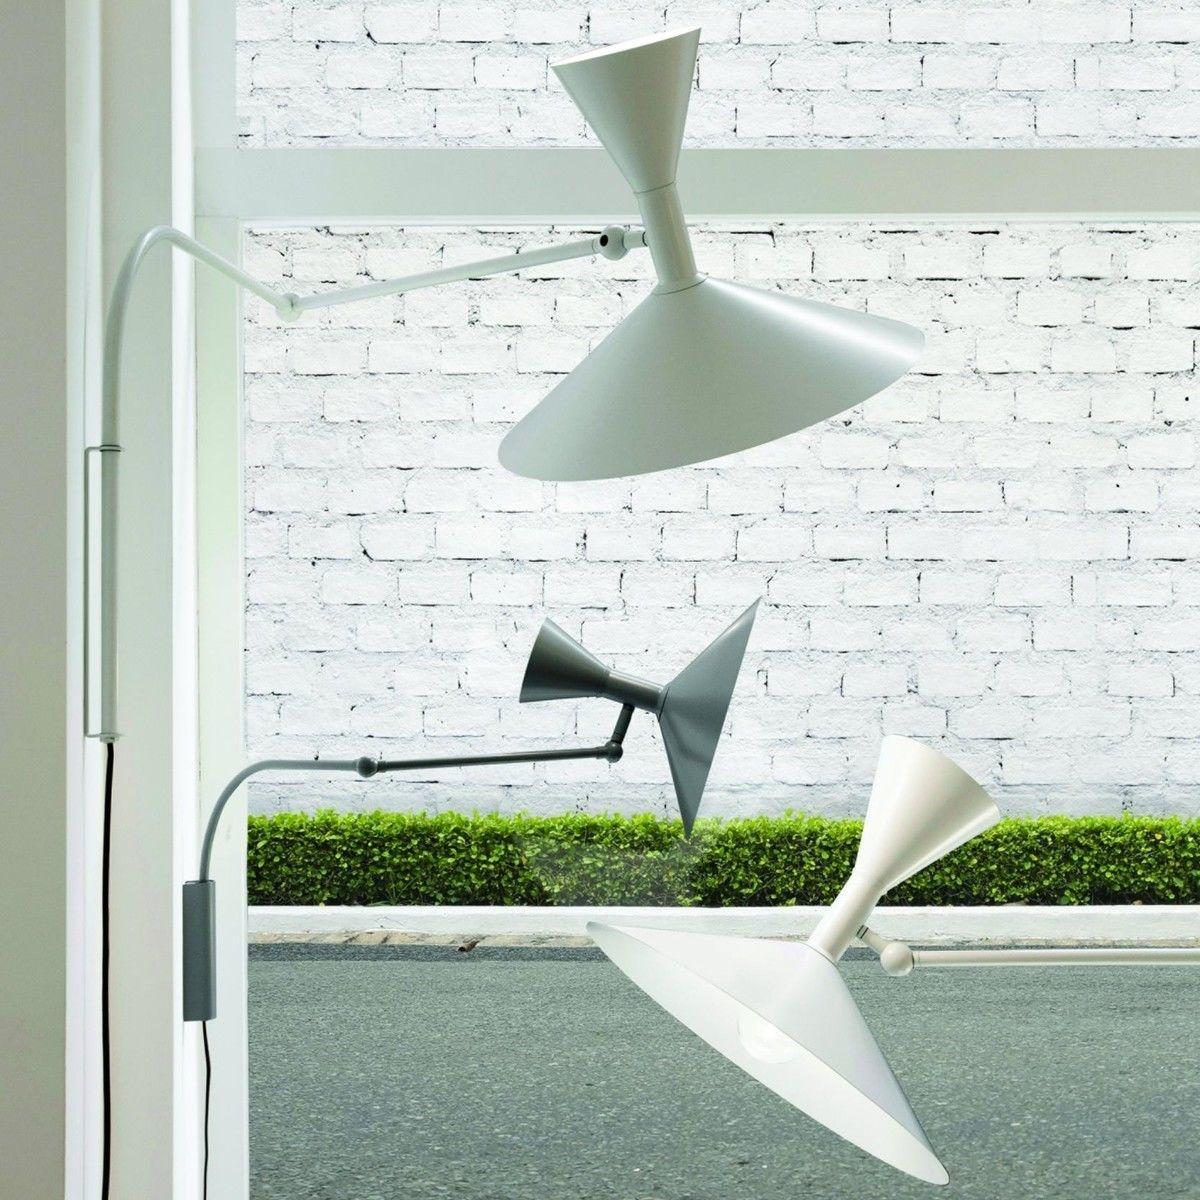 Lampe de marseille wall lamp nemo - Lampe de marseille le corbusier ...